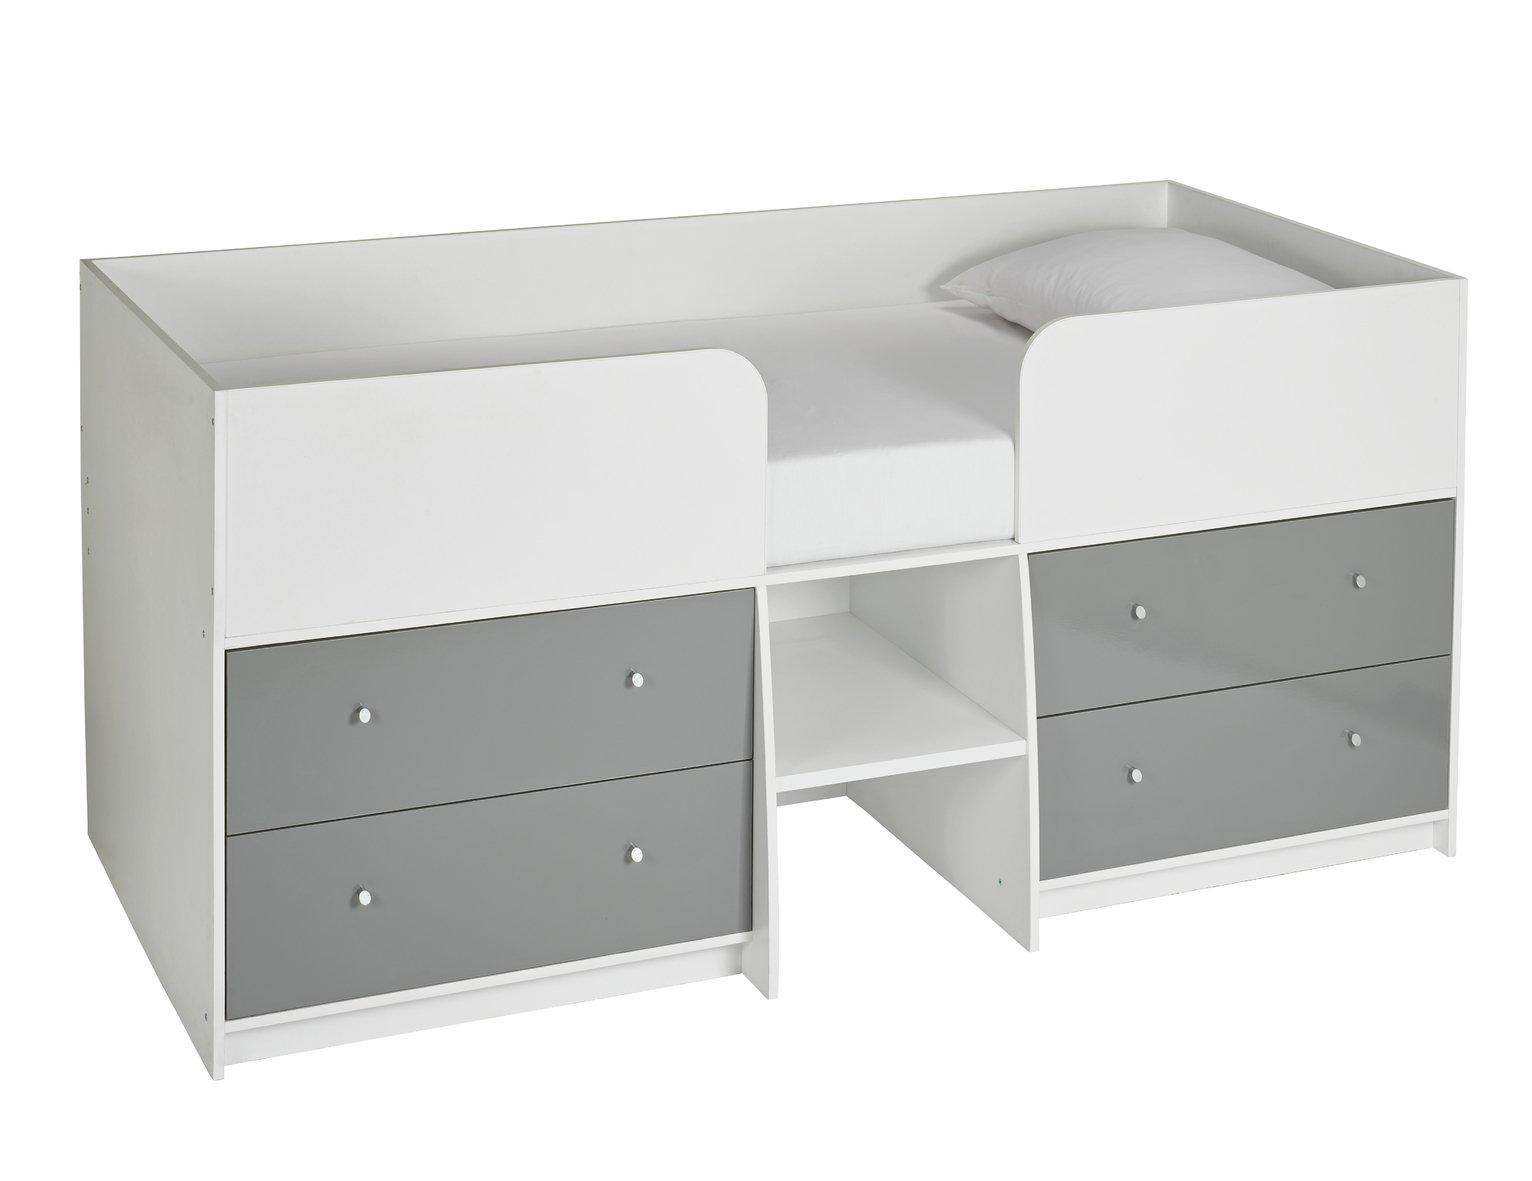 Argos Home Malibu Mid Sleeper - White & Grey Gloss